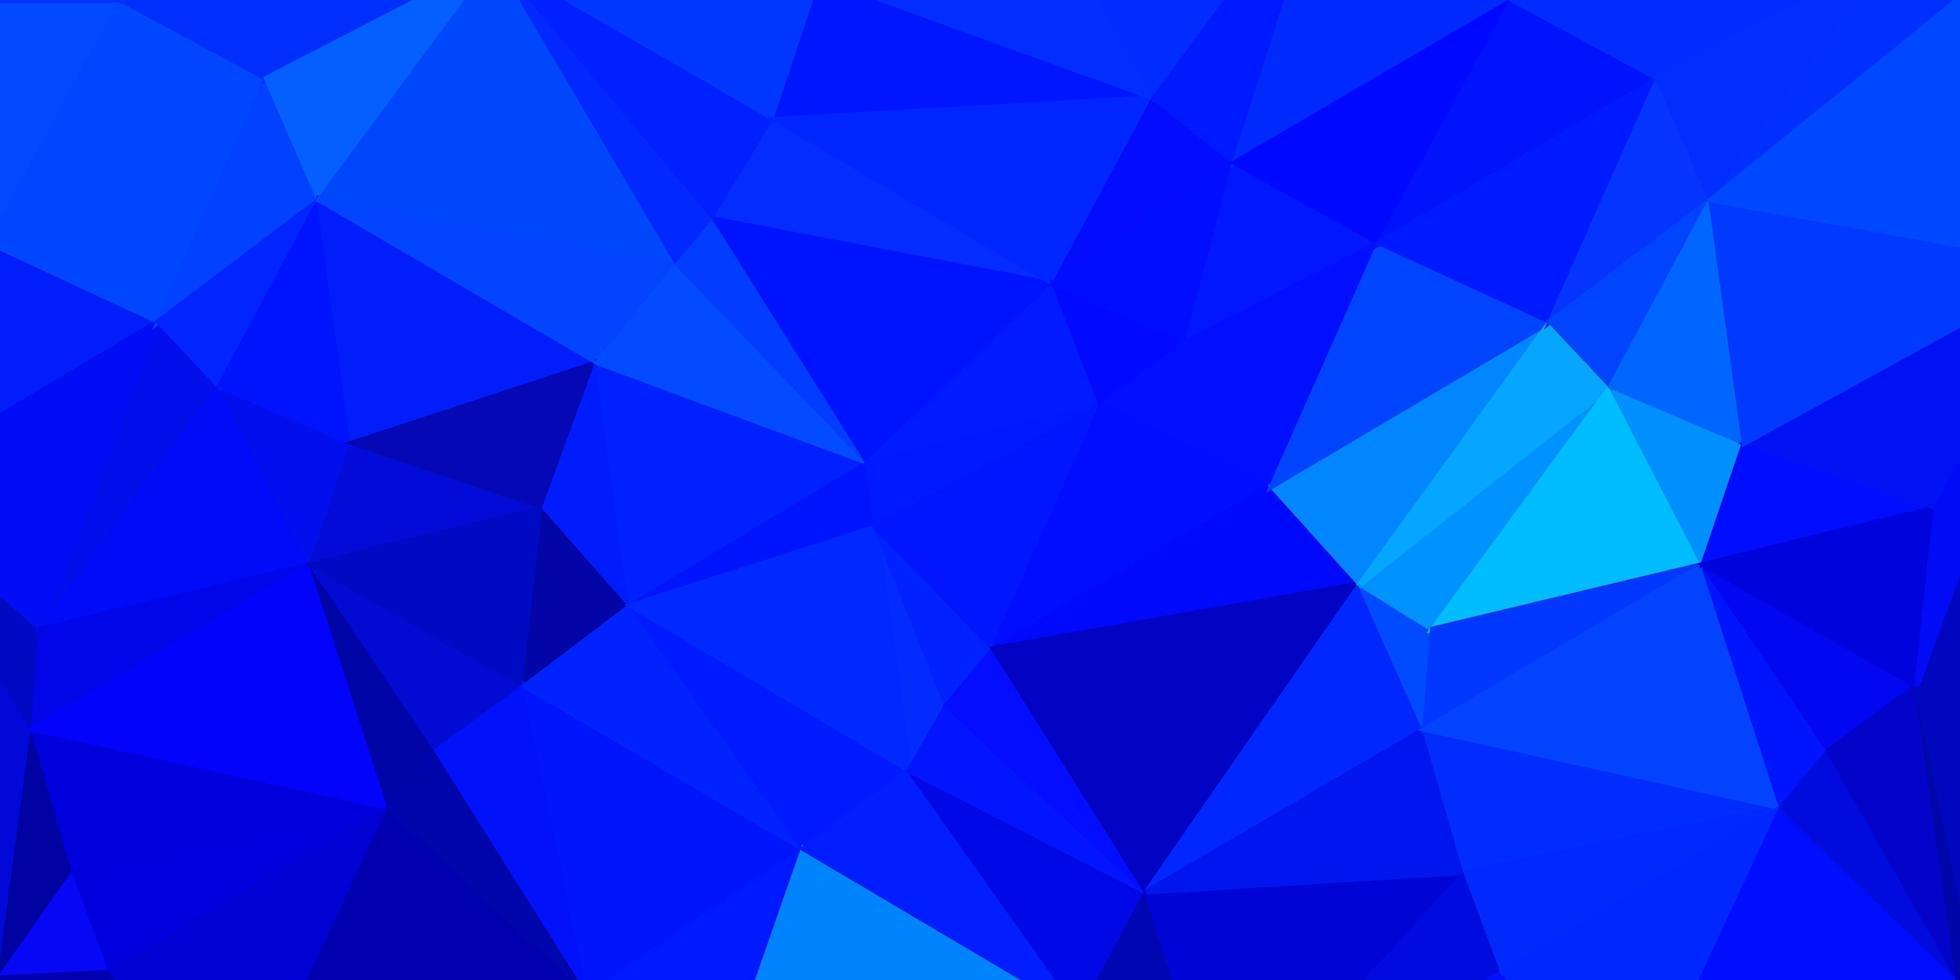 struttura poligonale gradiente vettoriale blu chiaro.